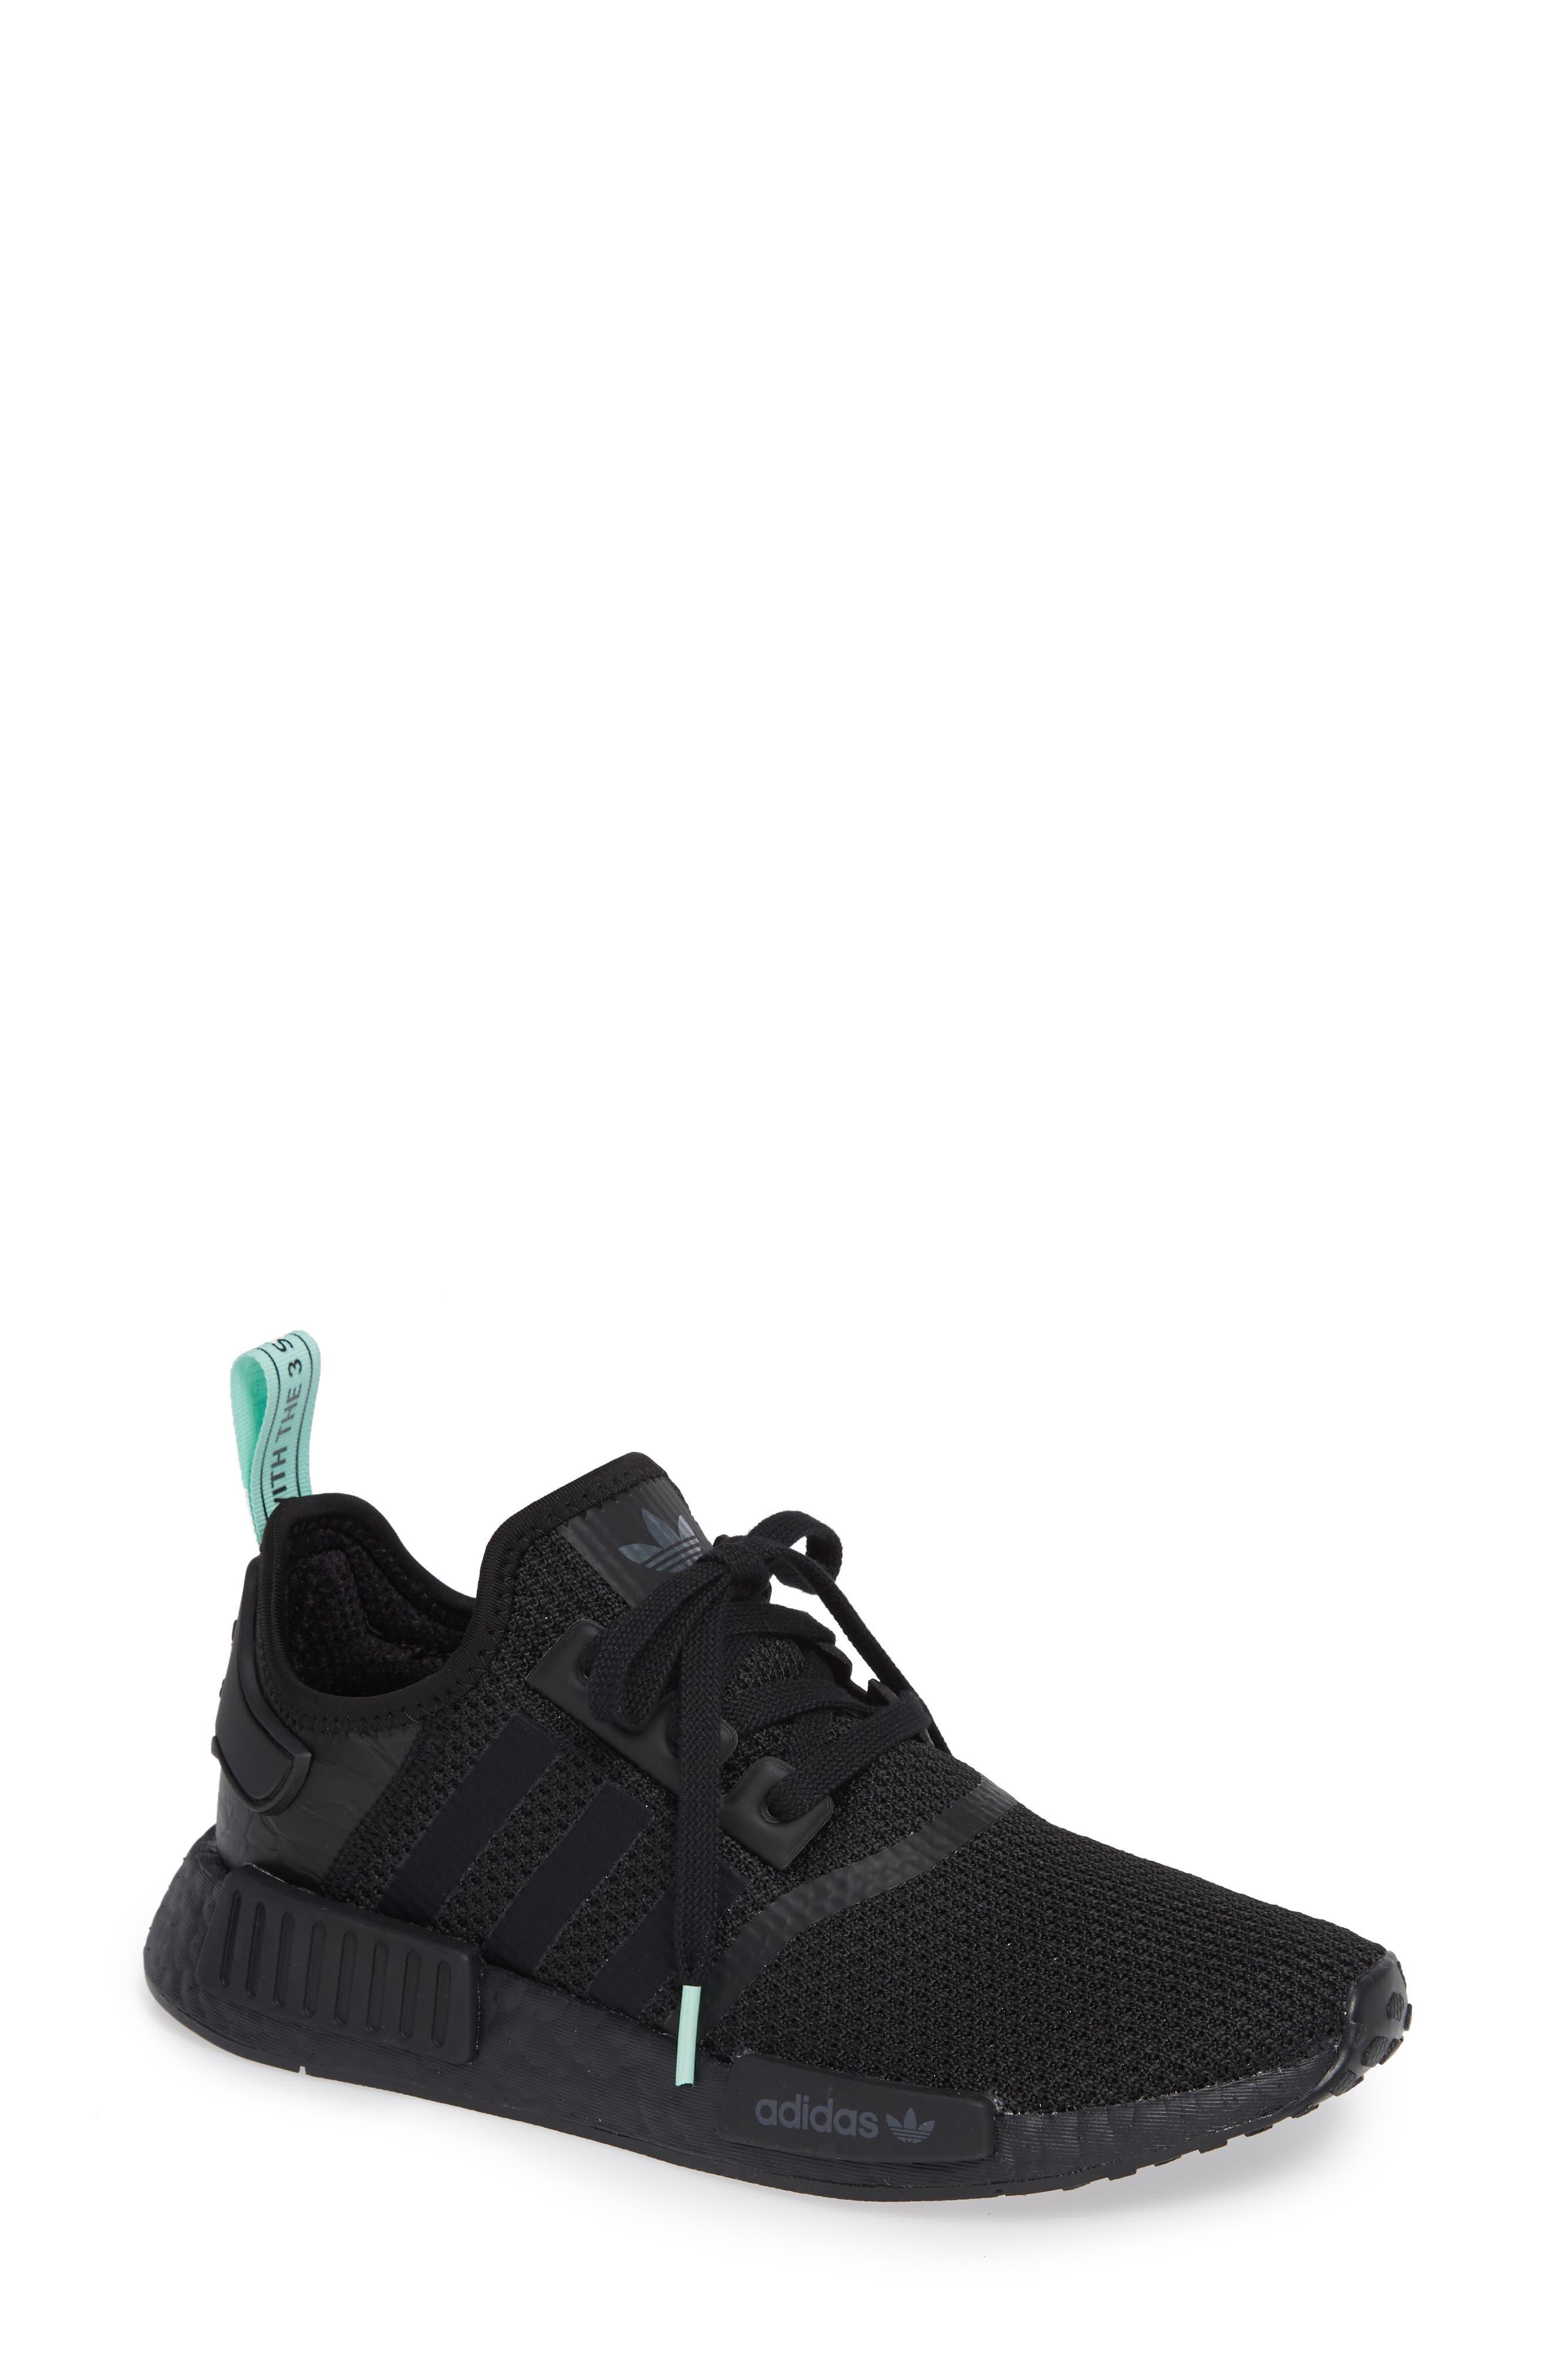 NMD R1 Athletic Shoe,                         Main,                         color, BLACK/ BLACK/ CLEAR MINT